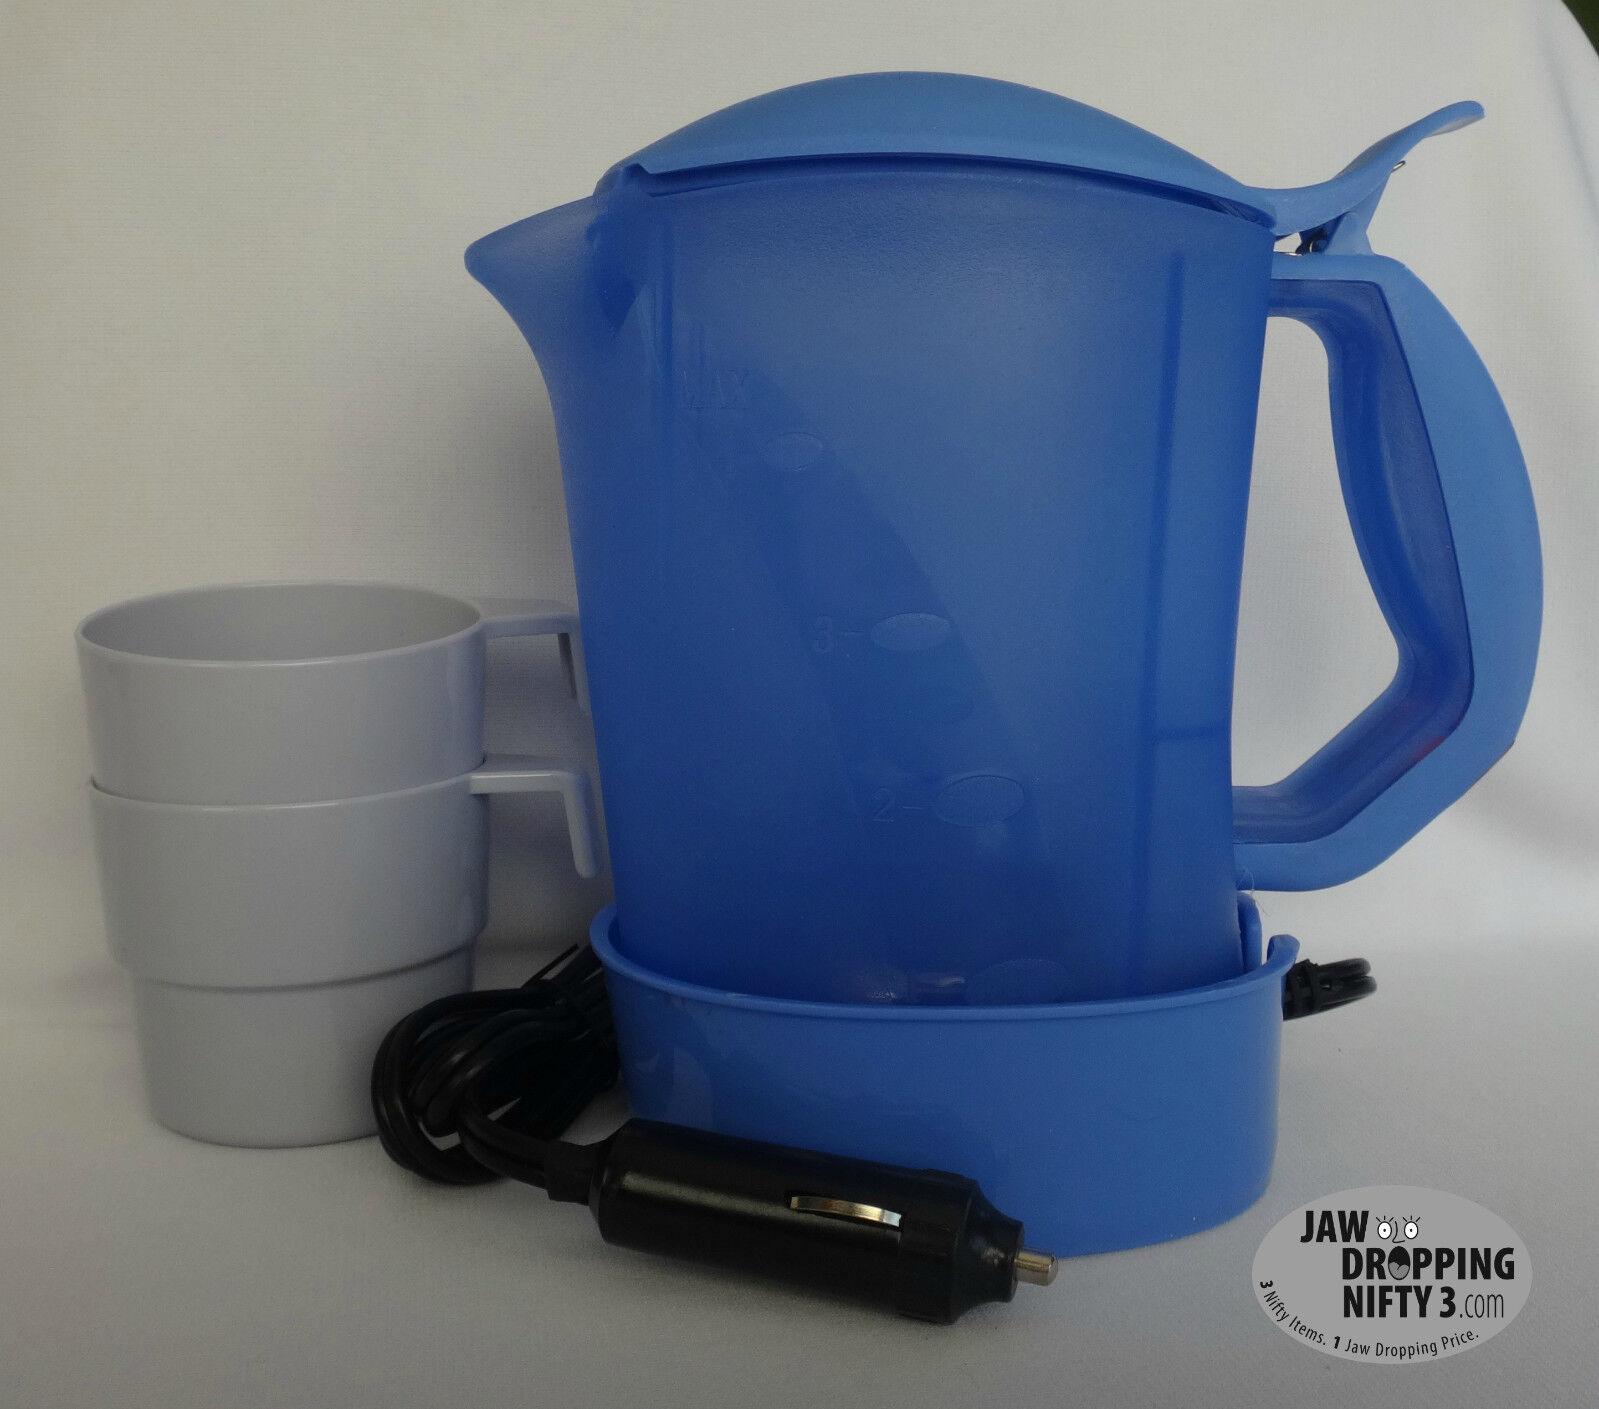 12v portable 4 cup coffee maker hot water pot car boat - Portable coffee maker for car ...